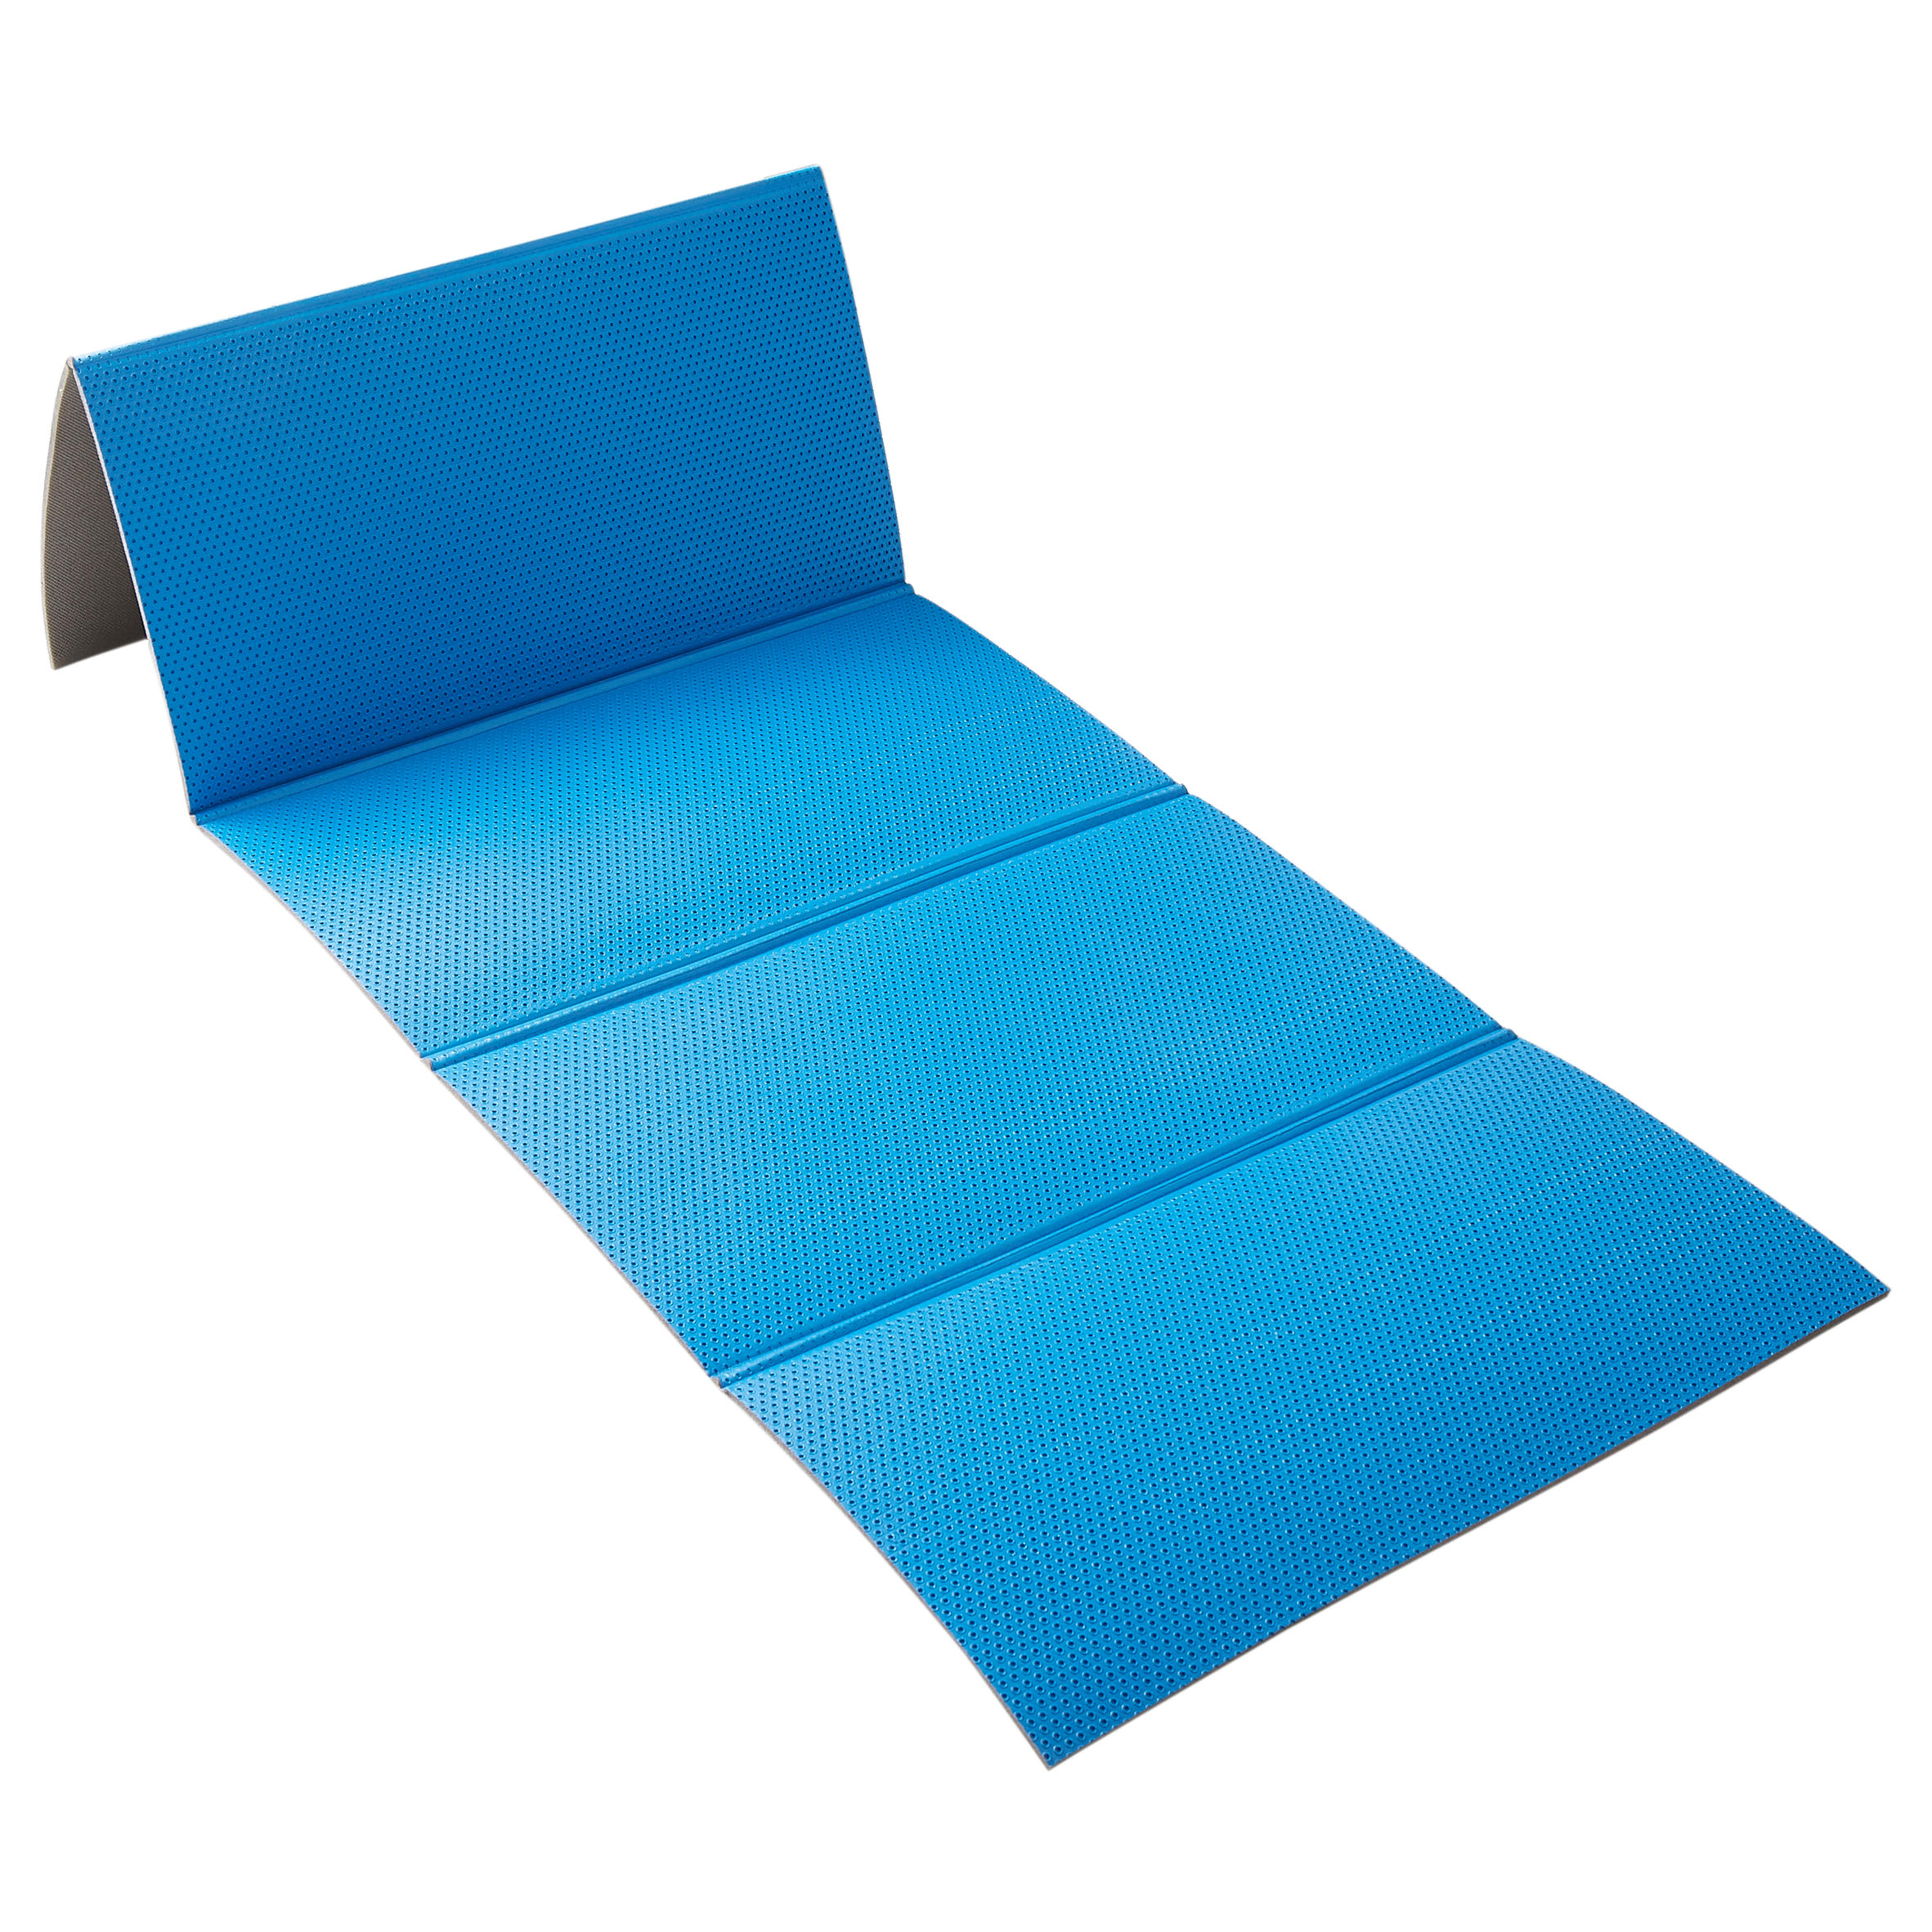 fitnessmatte faltbar 160 cm 60 cm 7 mm